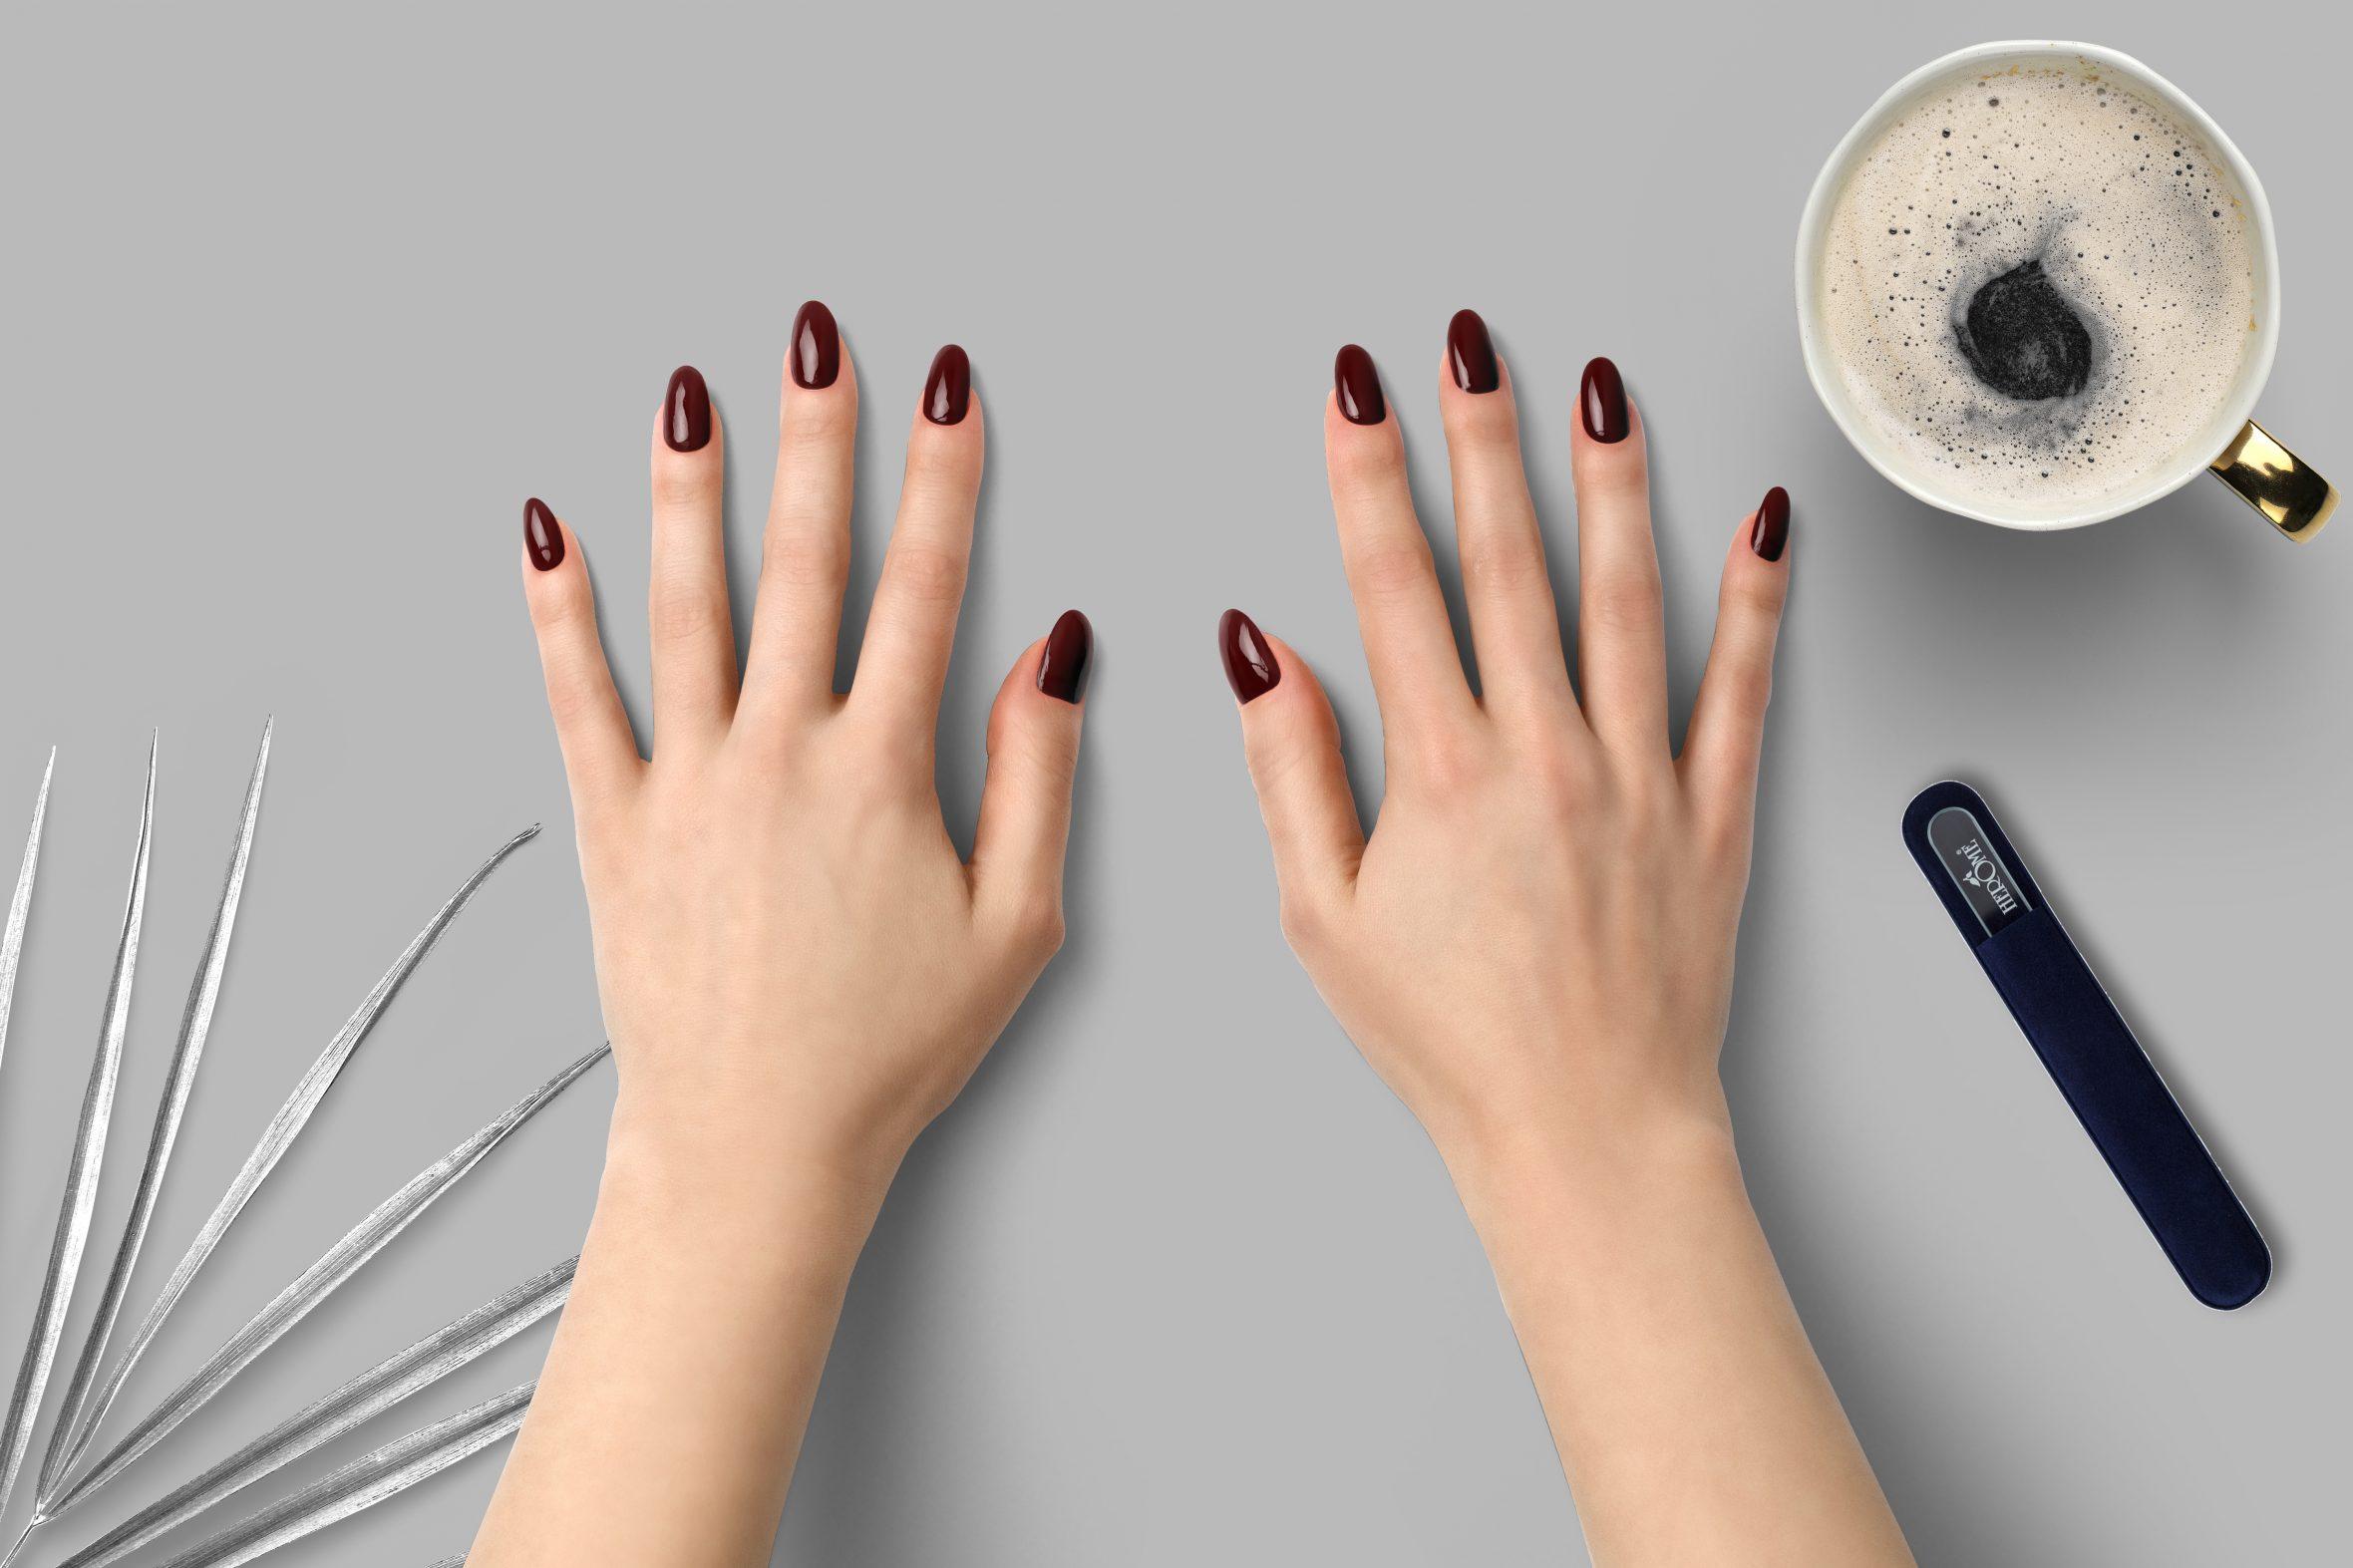 Wijnrode nagellak op je nagels als toevoeging op je nagellak set